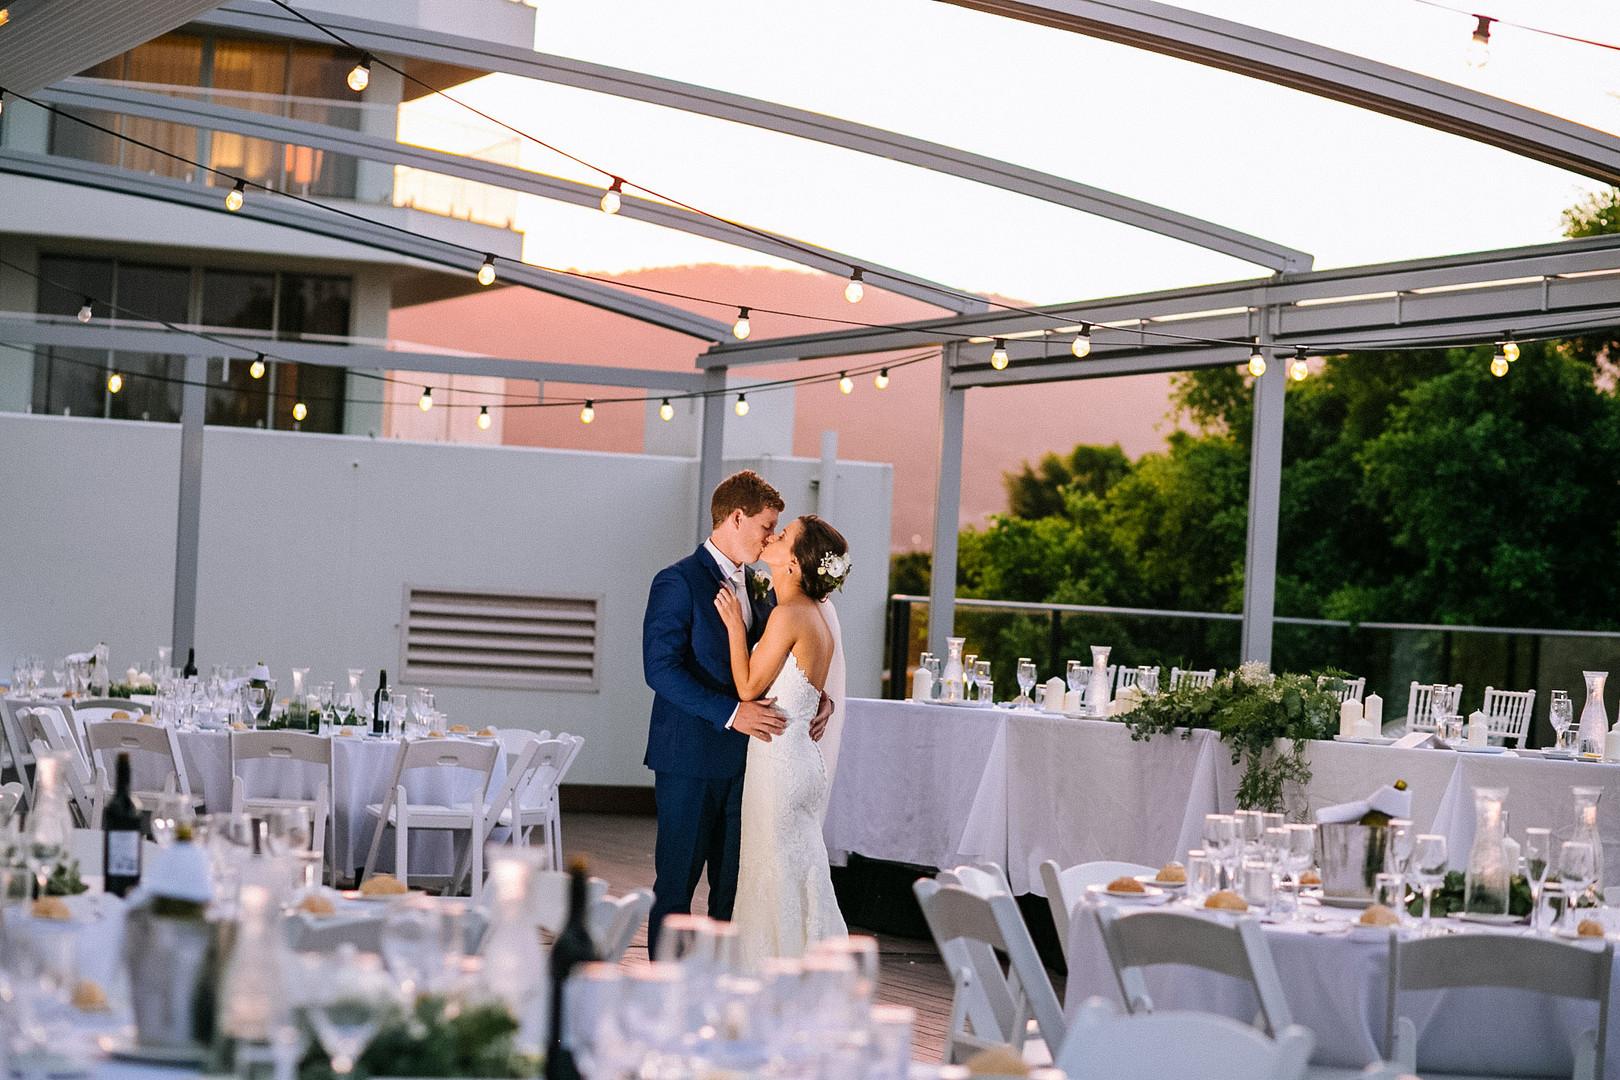 WeddingWebsite_Compressed-56.jpg